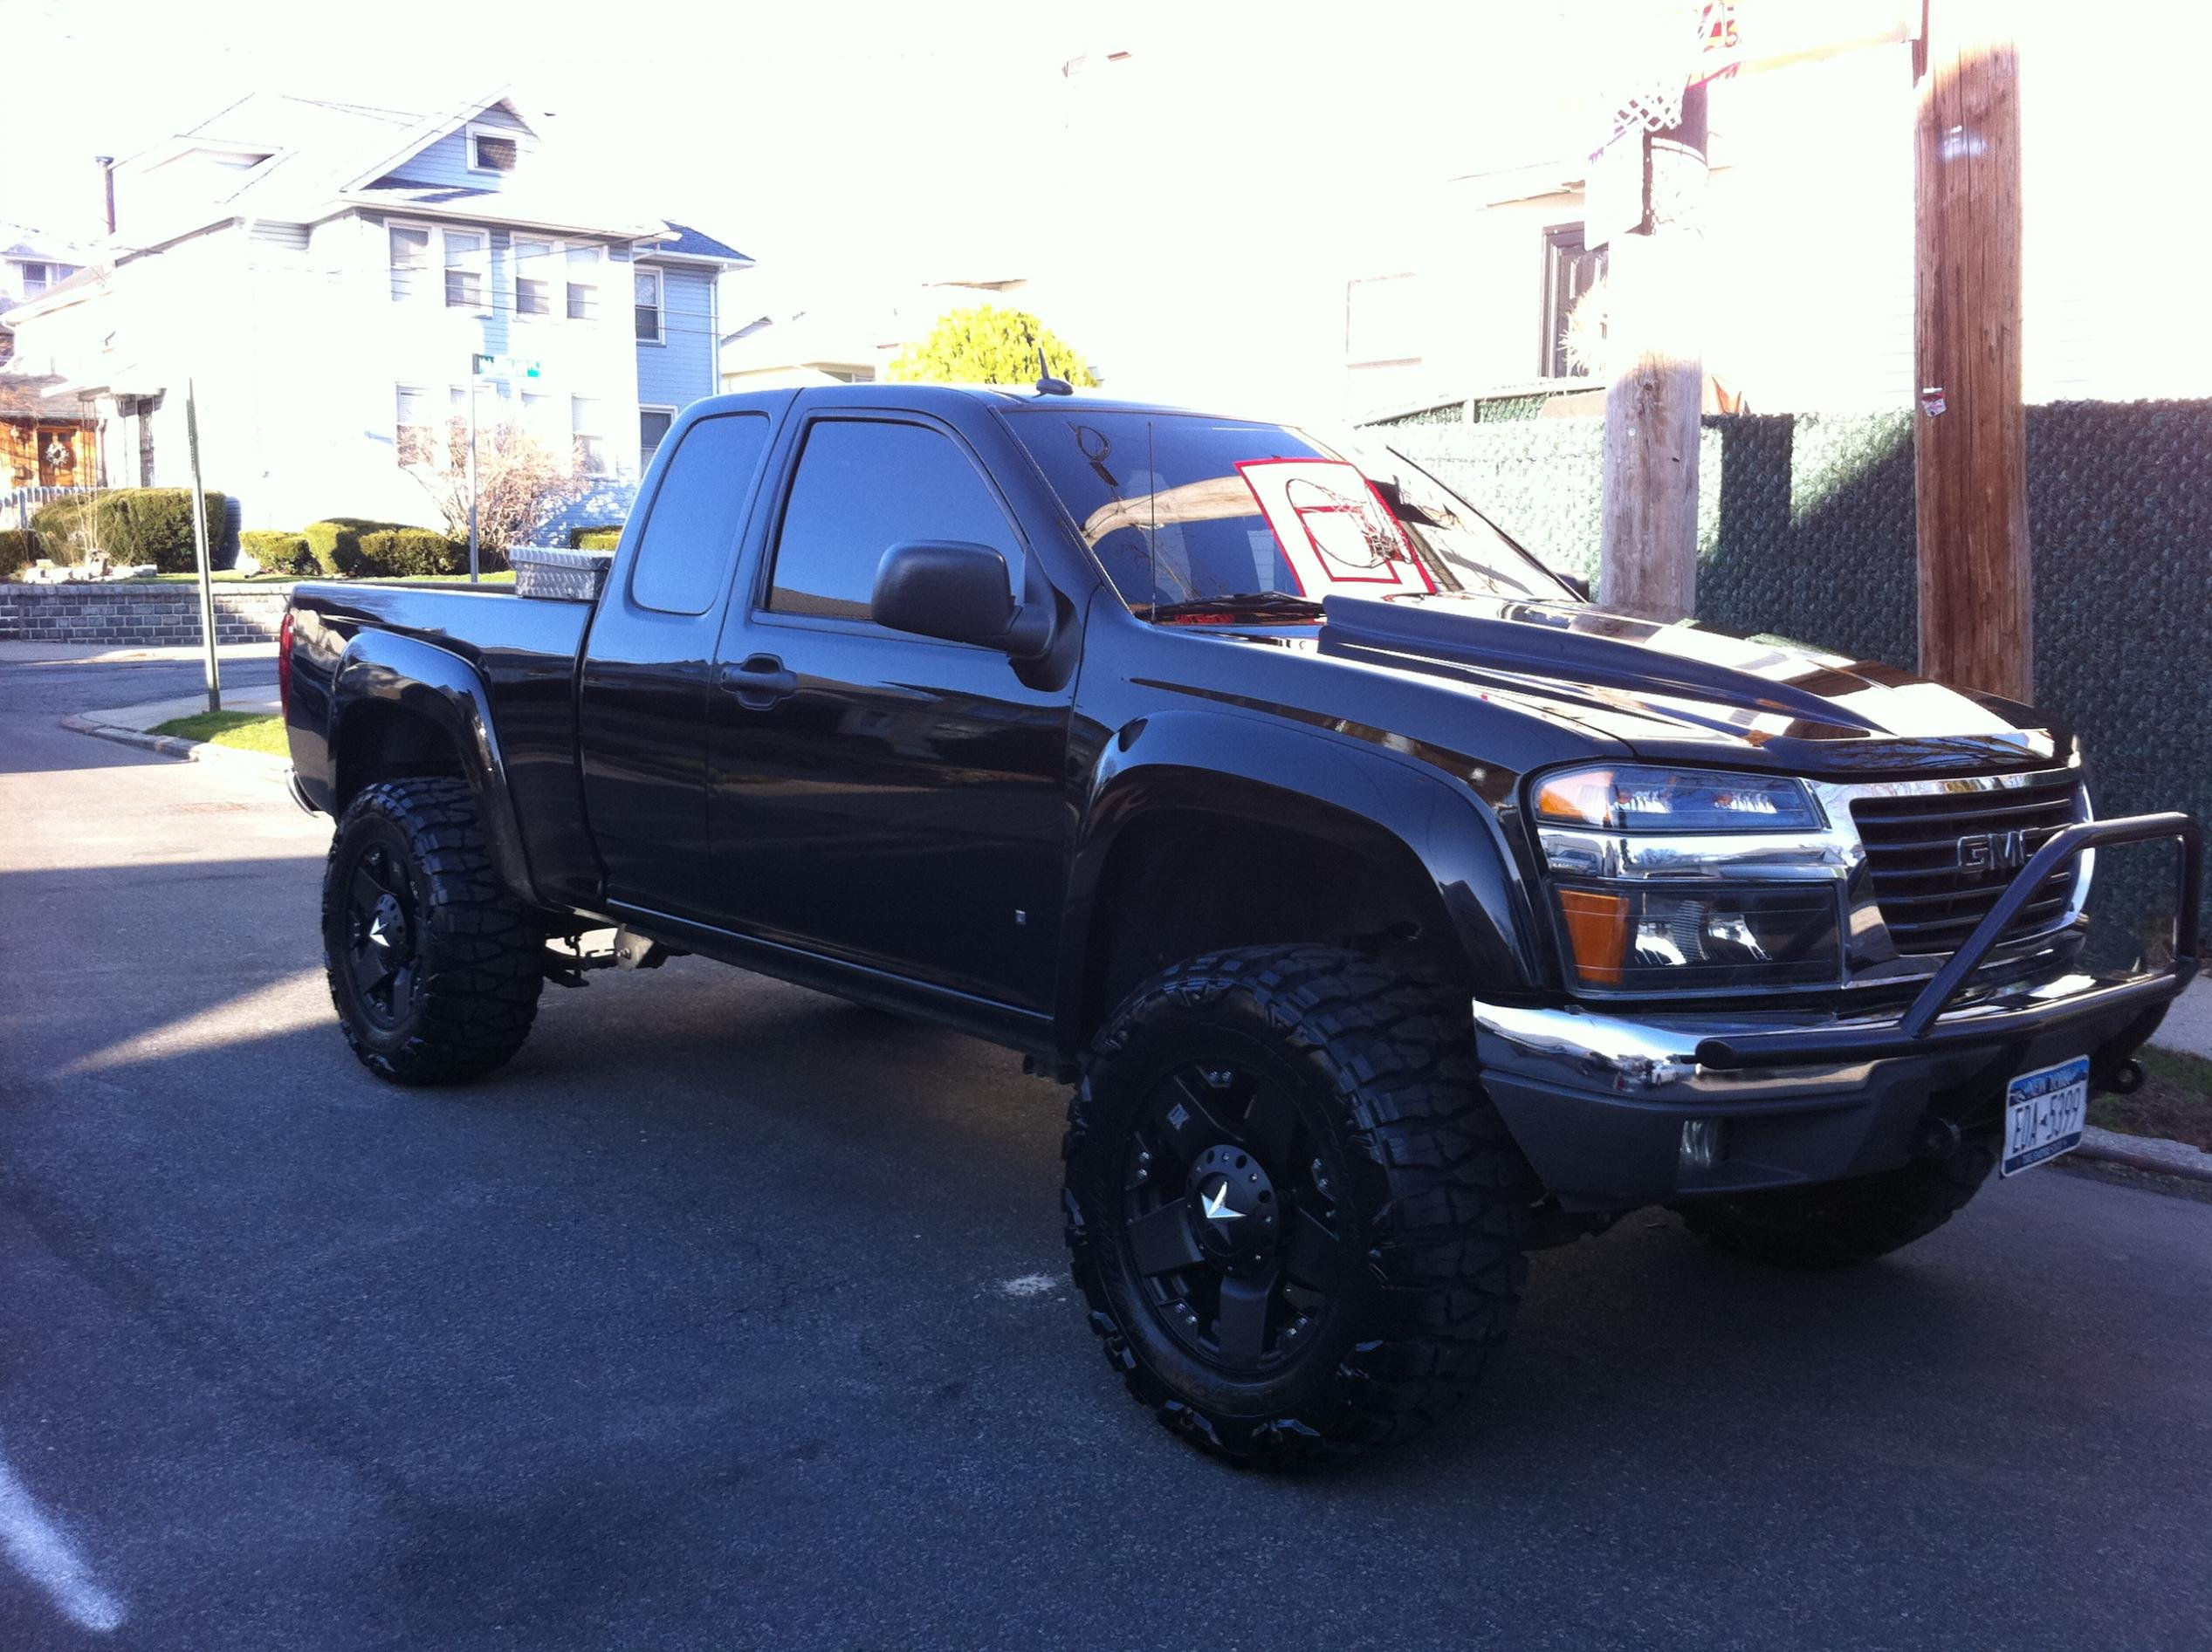 texas images heatwave in sierra dealers gmc dealerss convertable of truck